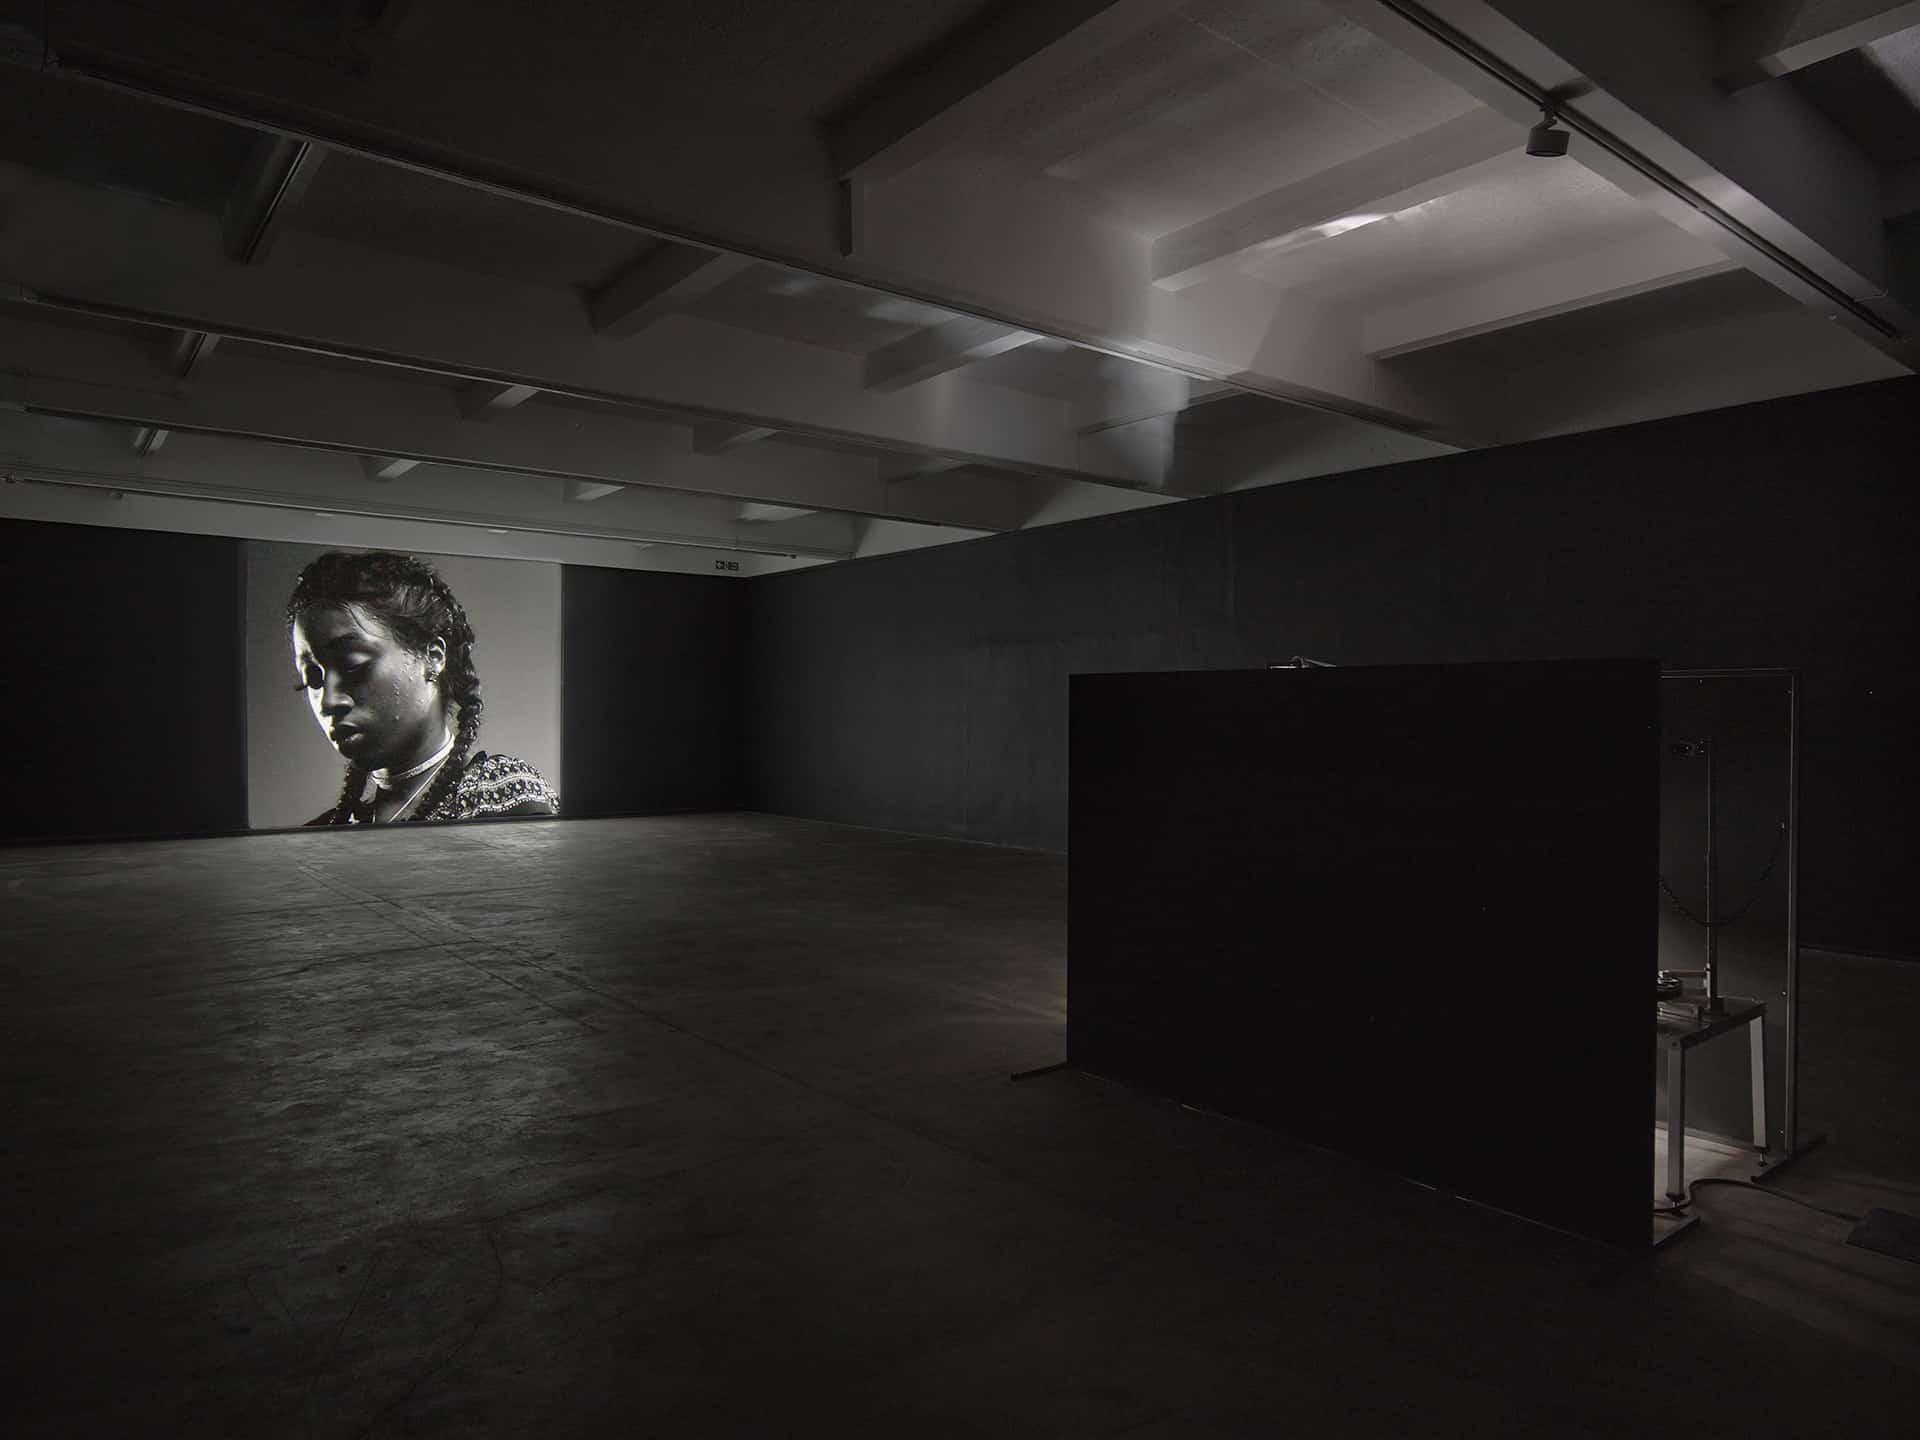 Luke Willis Thompson at Chisenhale Gallery, Andy Keate